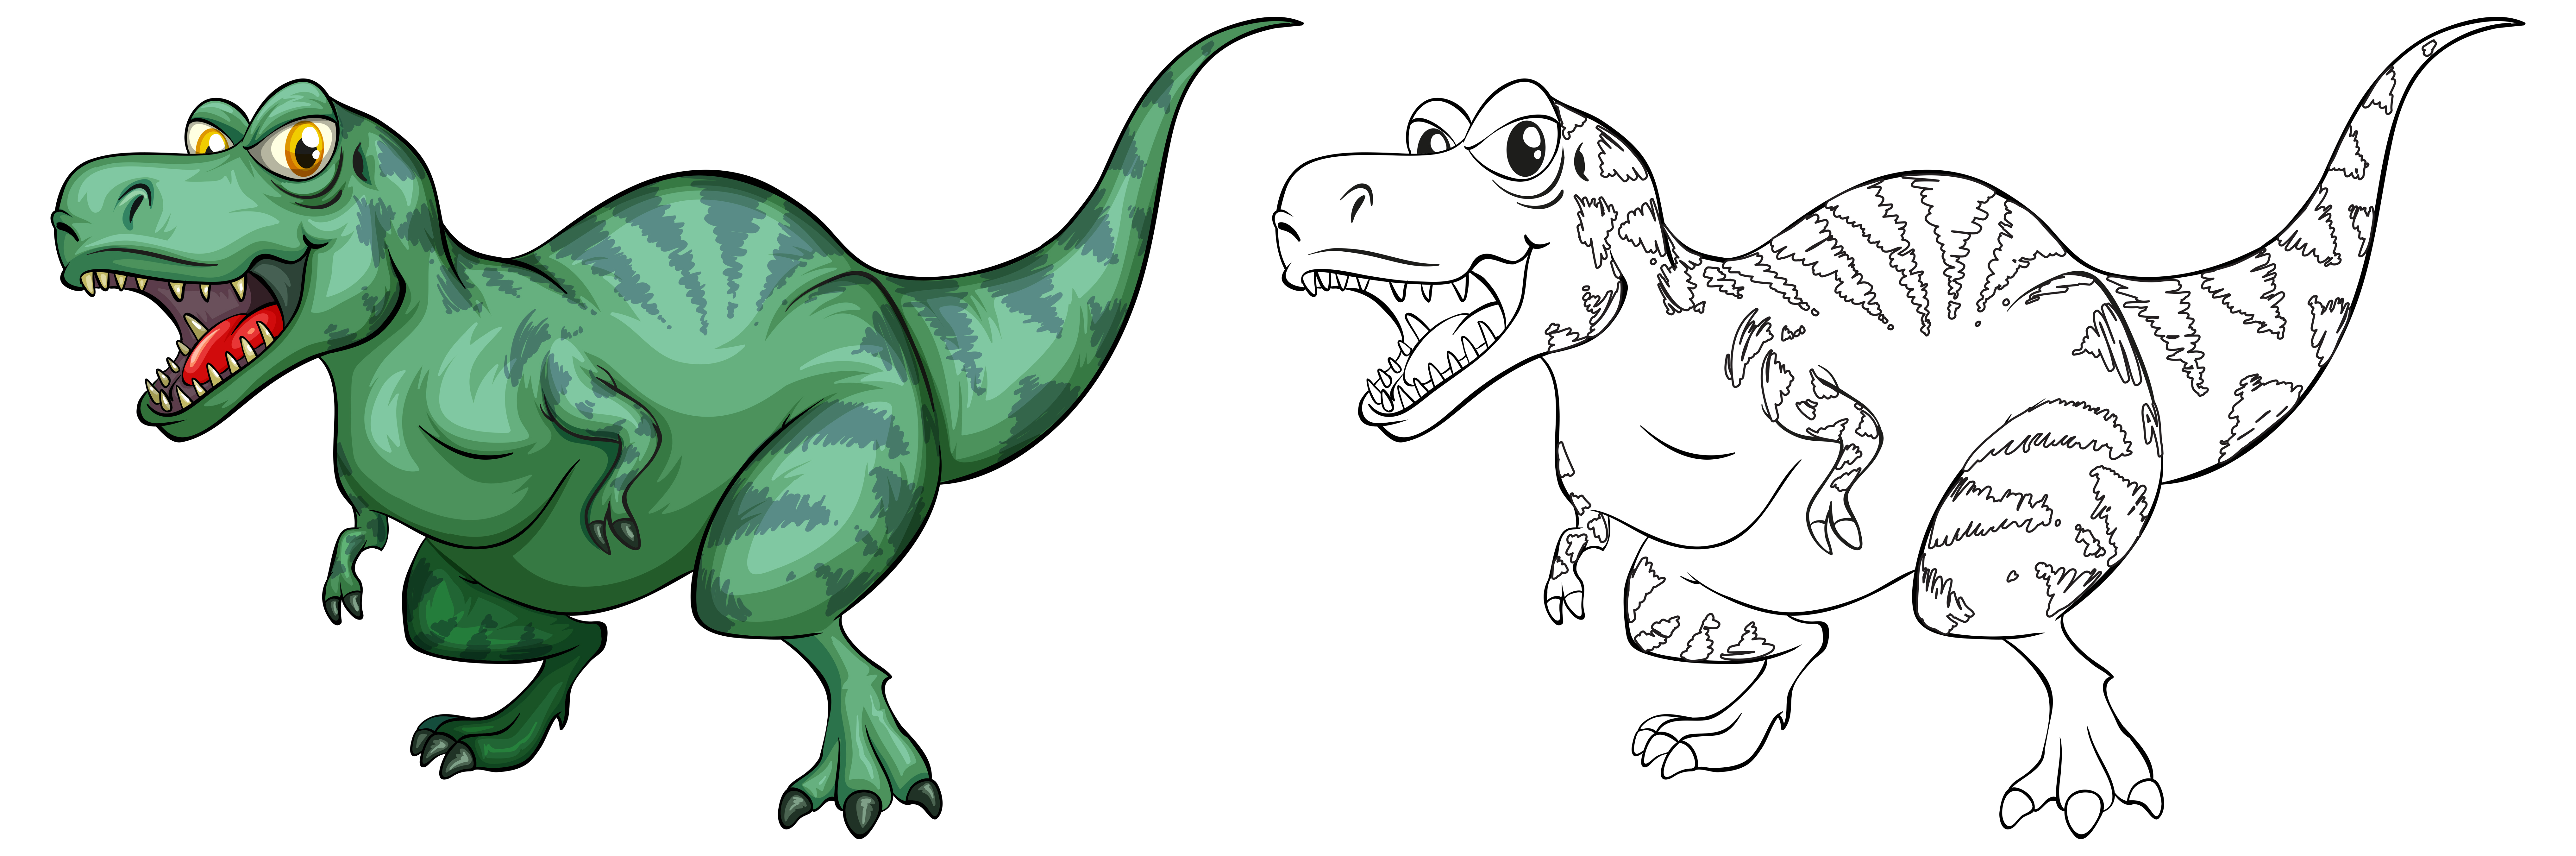 Contorno Animal Para Dinossauro T Rex Download Vetores Gratis